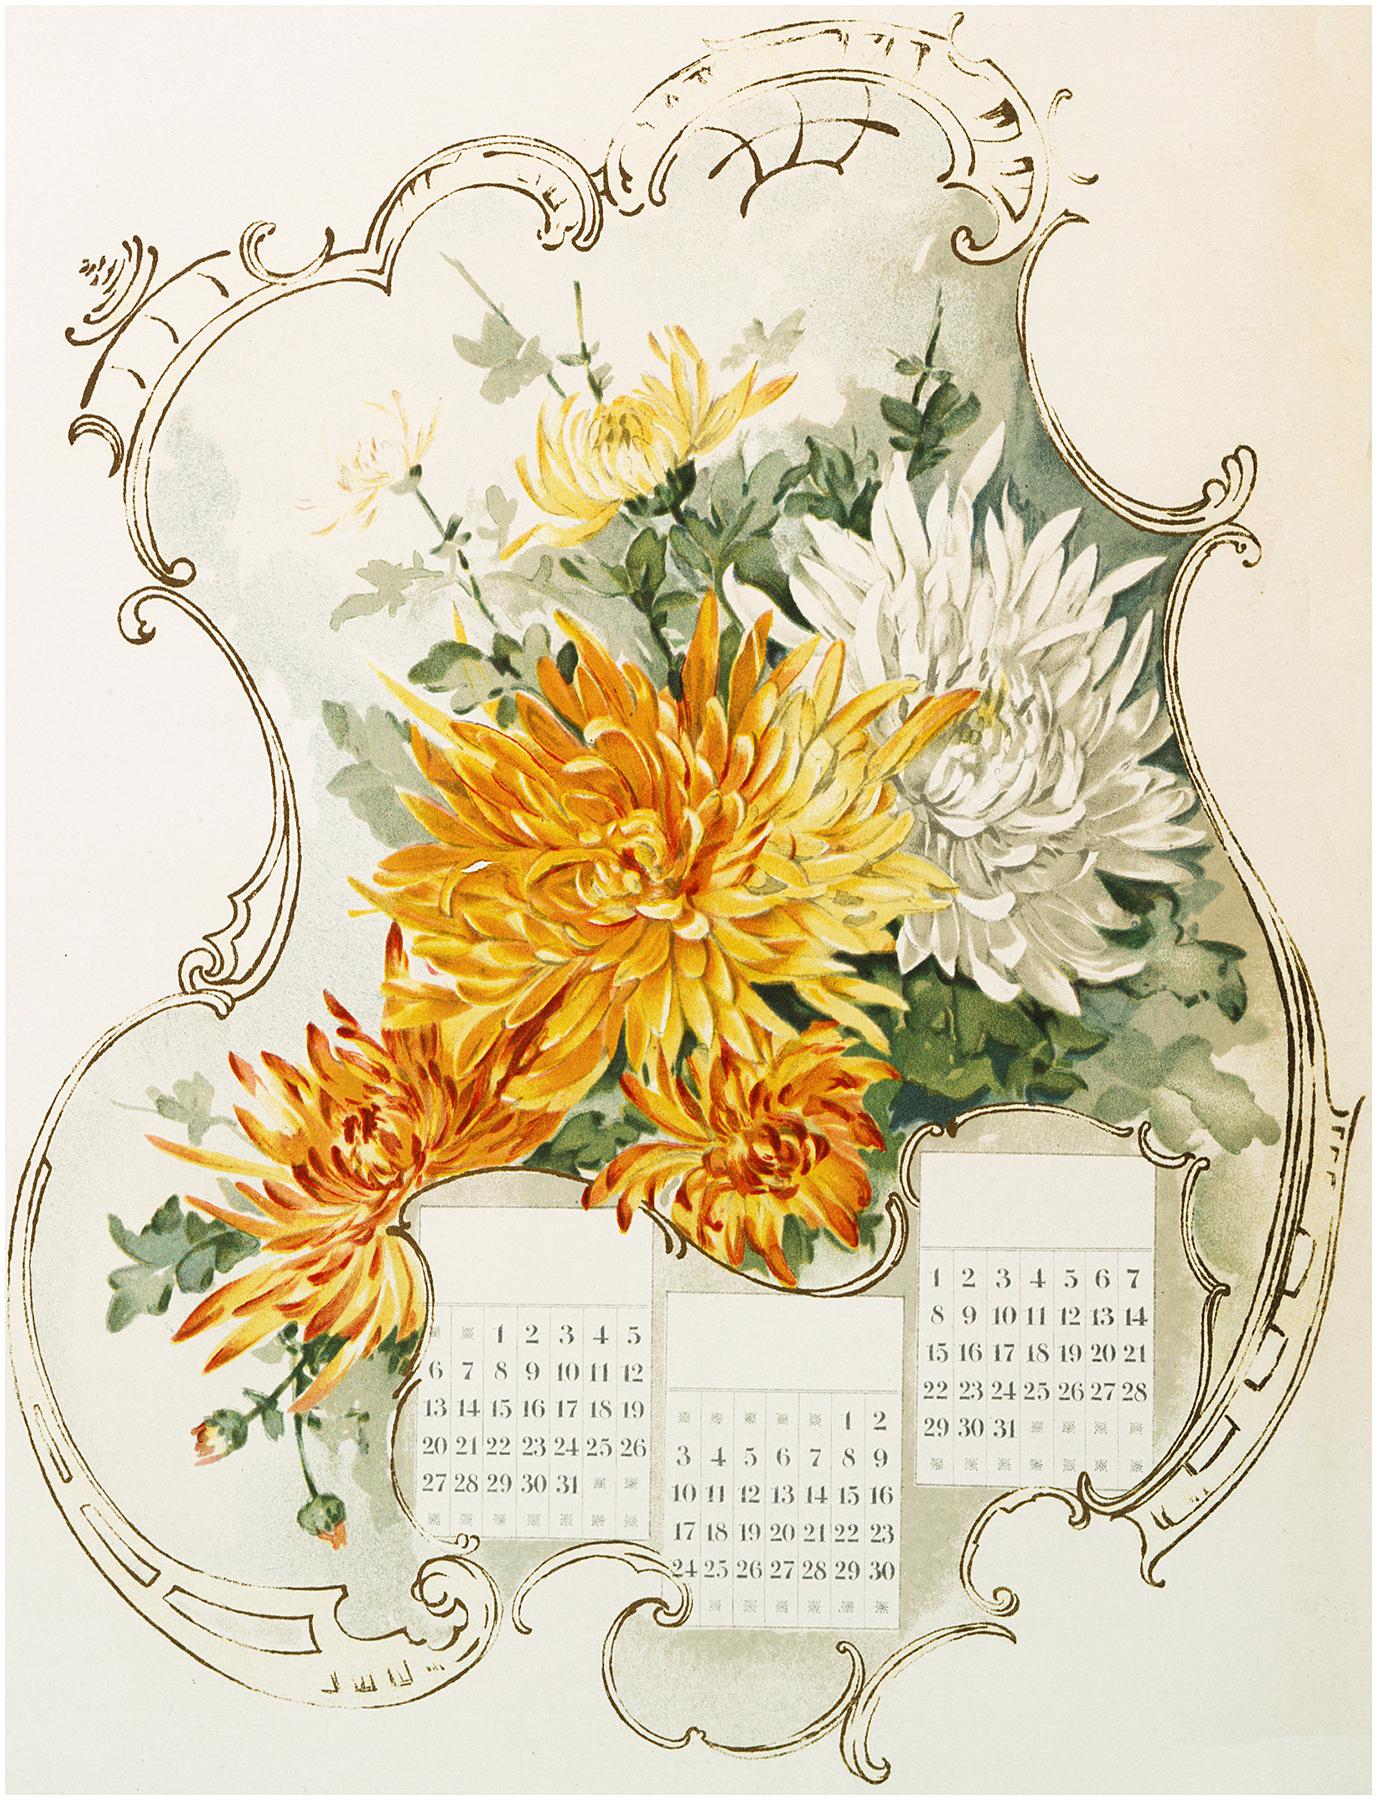 Floral Mums Calendar Image